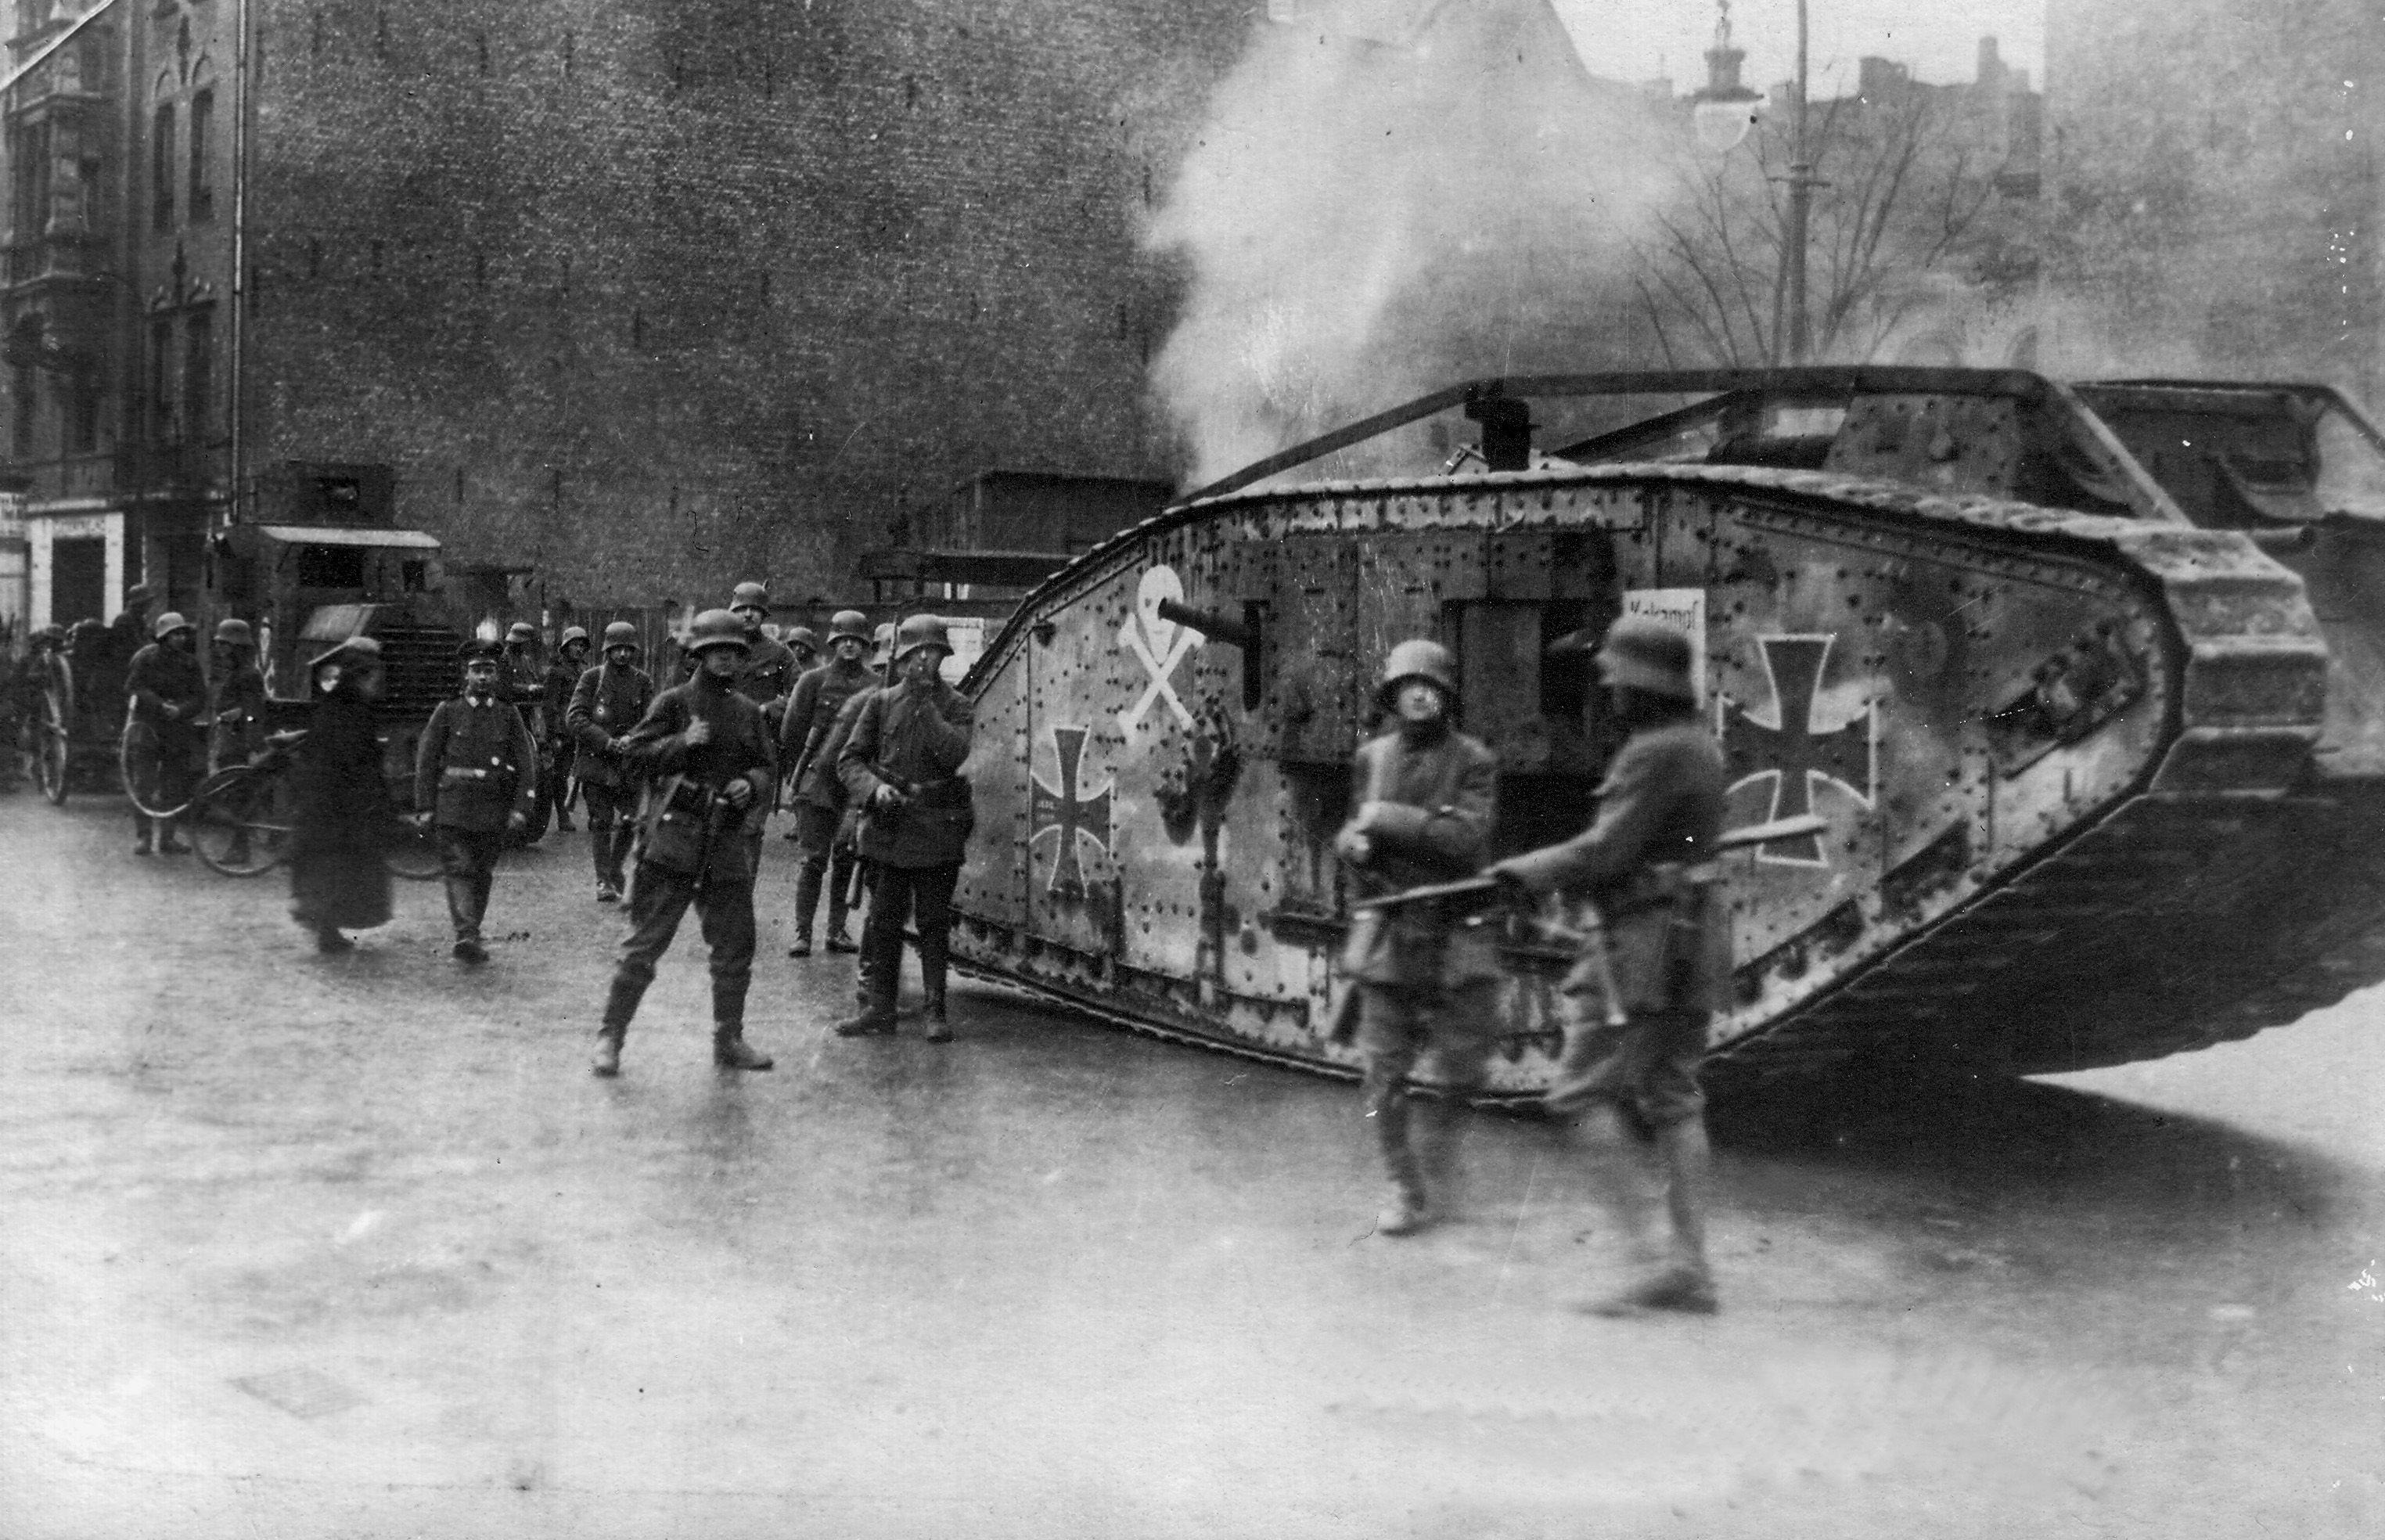 British Steel – Mk IV Tank in Berlin, Germany 1919